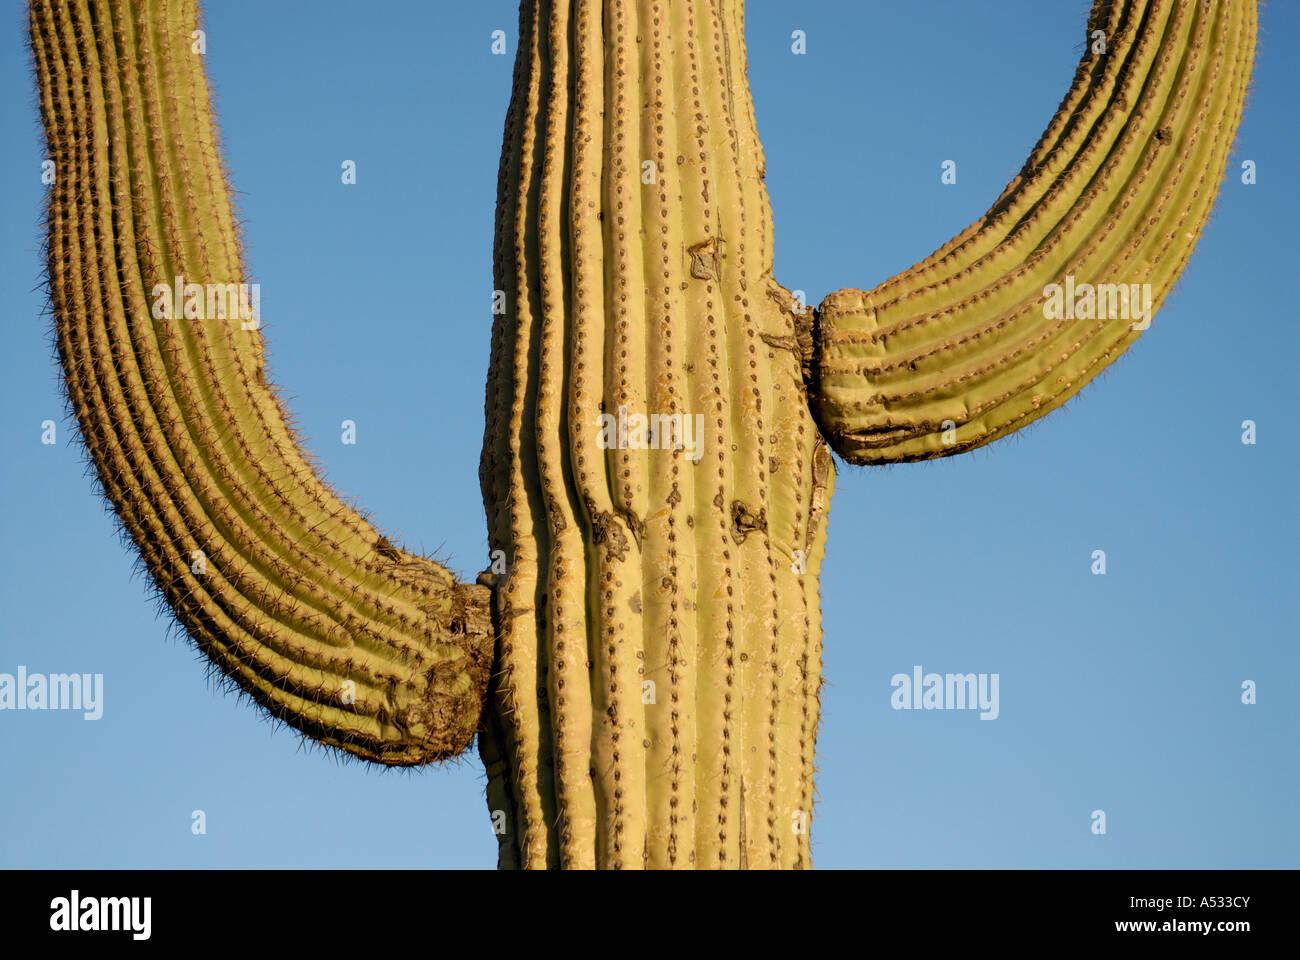 Saguaro Cactus, Carnegiea gigantea, with two arms against blue sky, Sonoran Desert, southwestern USA - Stock Image